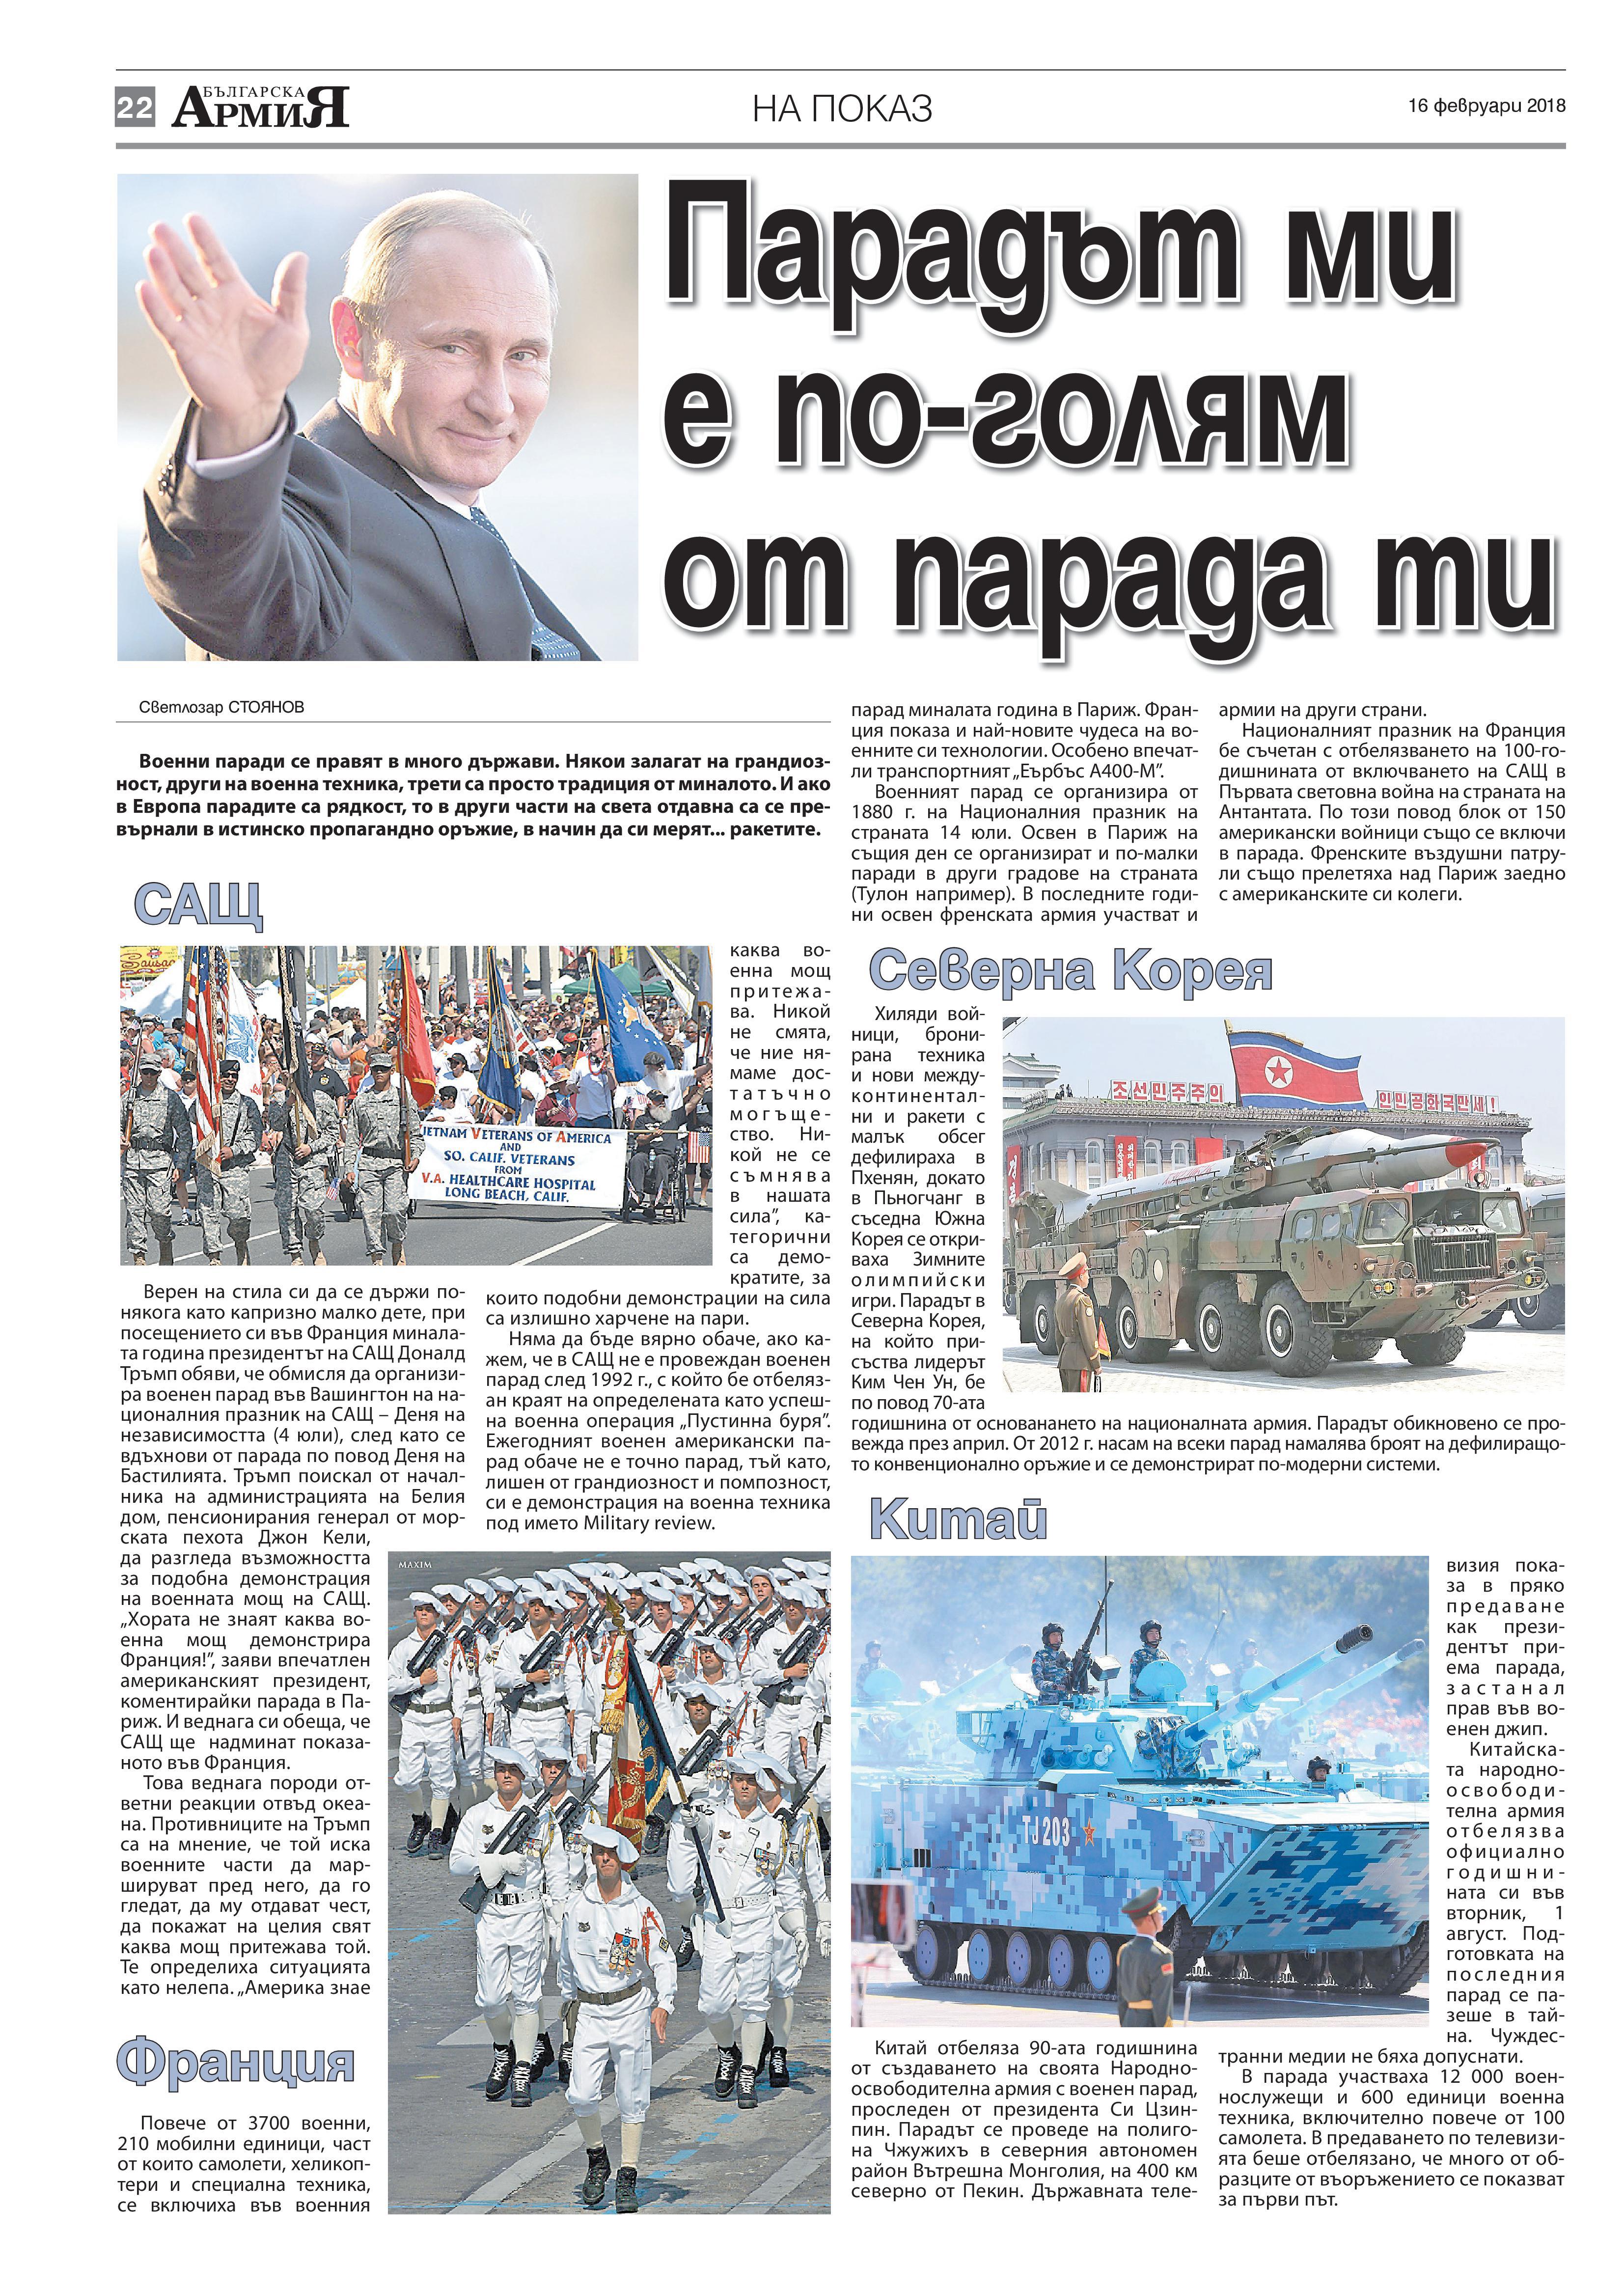 http://armymedia.bg/wp-content/uploads/2015/06/22-20.jpg